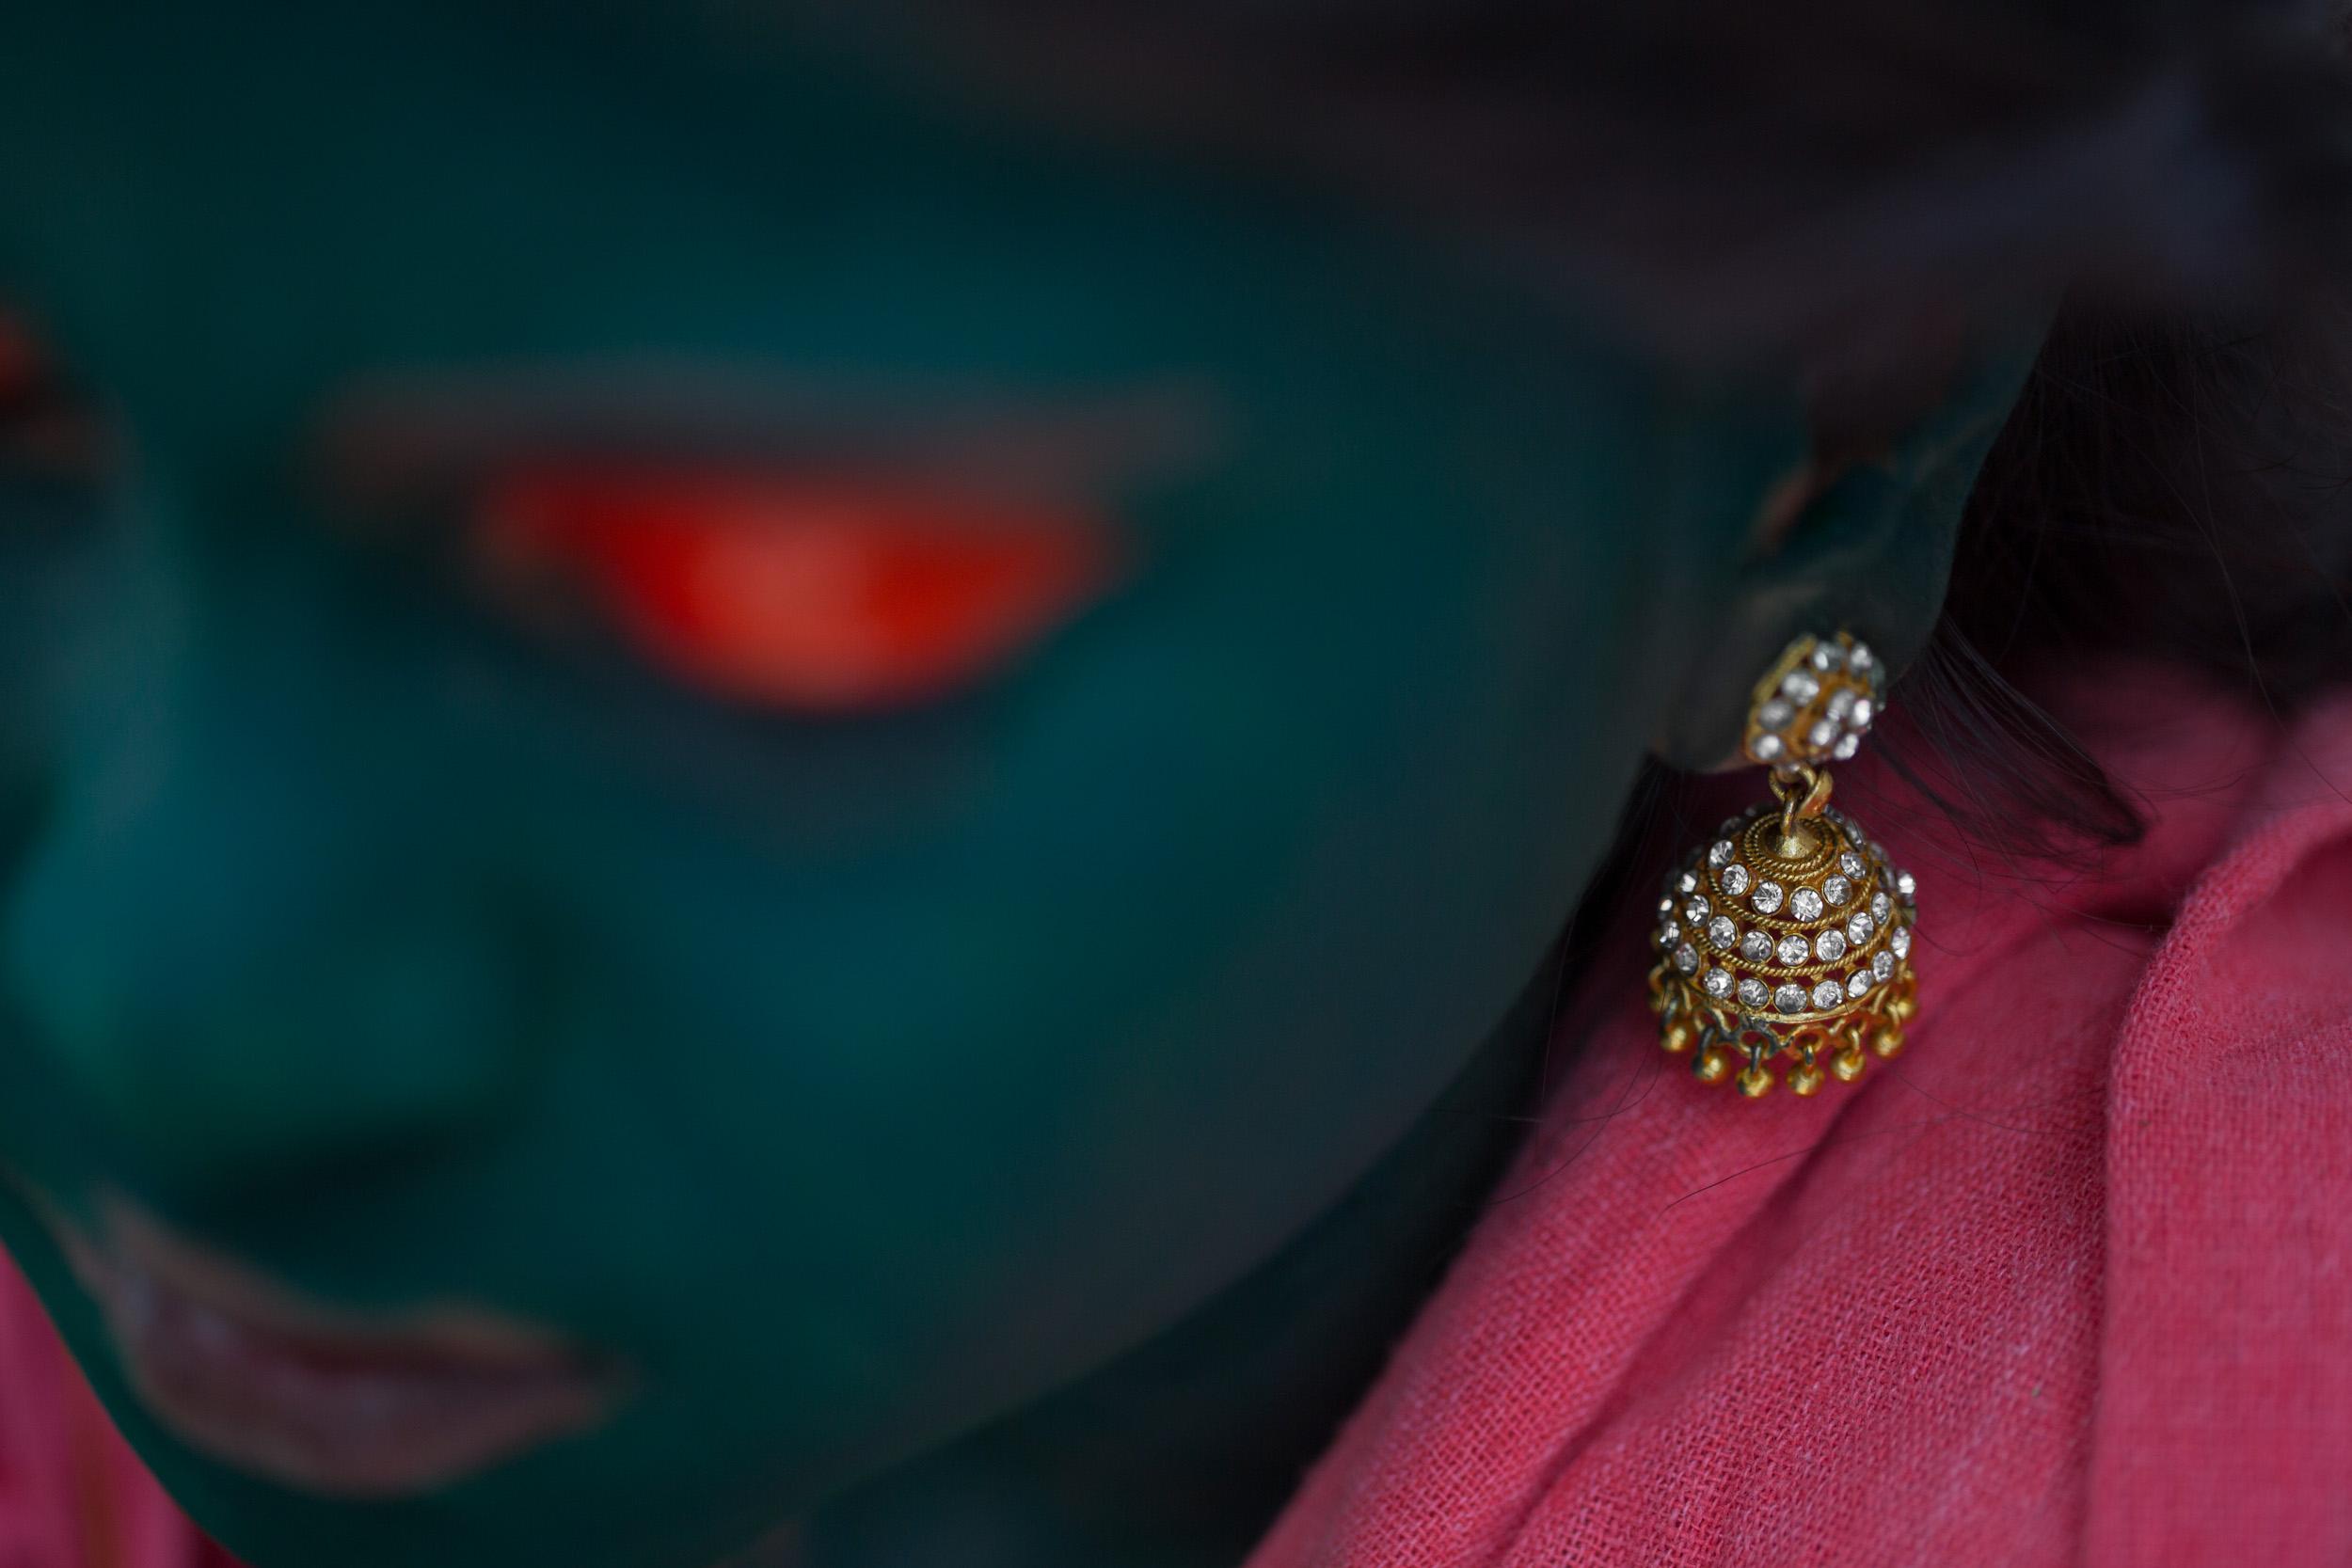 Sindhur_Photography_Travel_People_Art-A-2.JPG